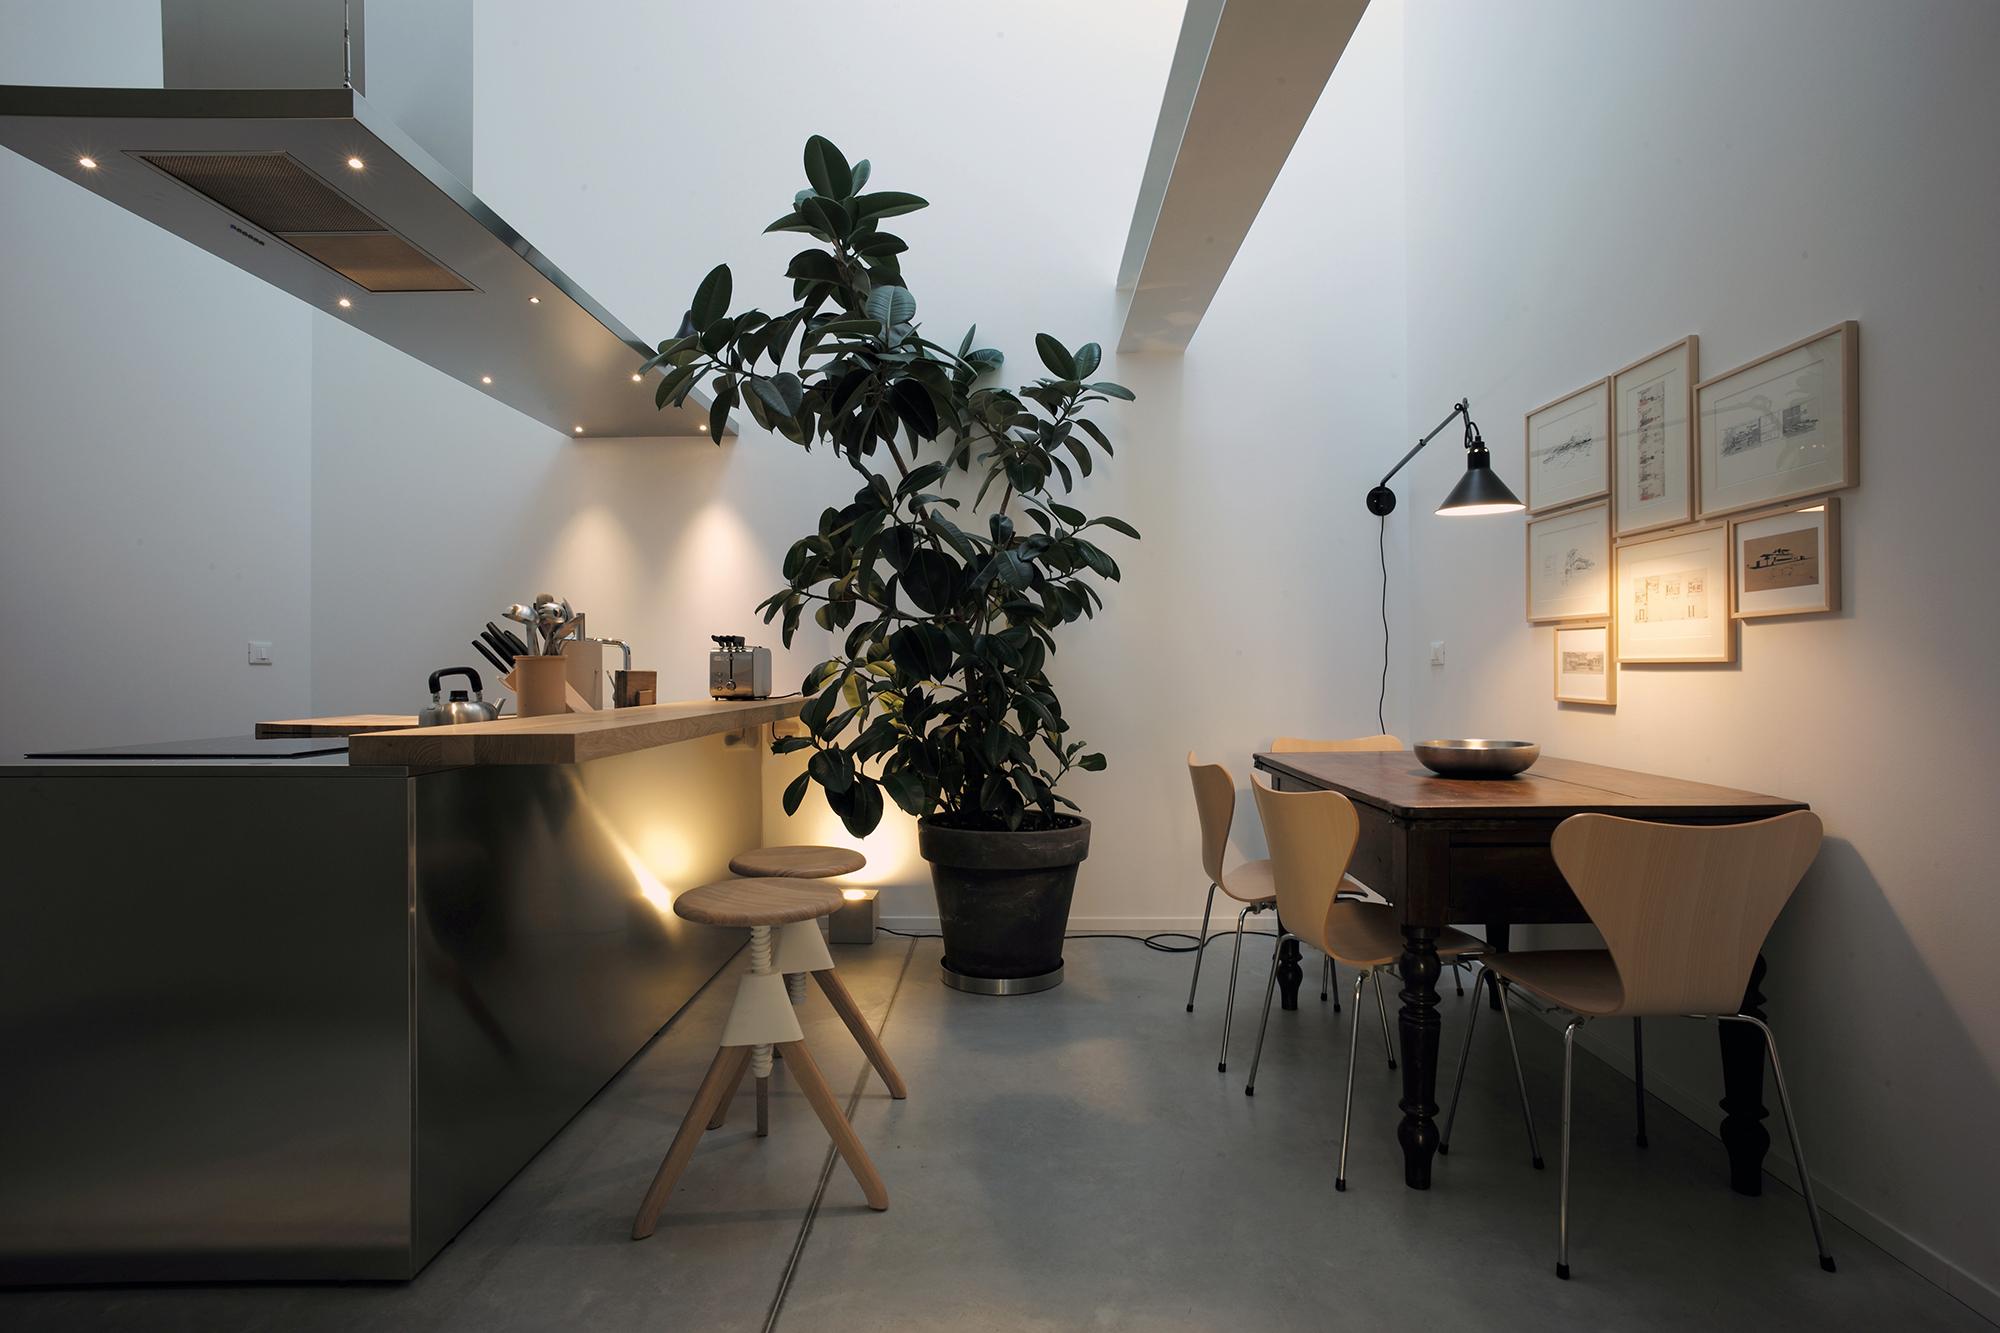 ex-warehouse-lofts-01.jpg